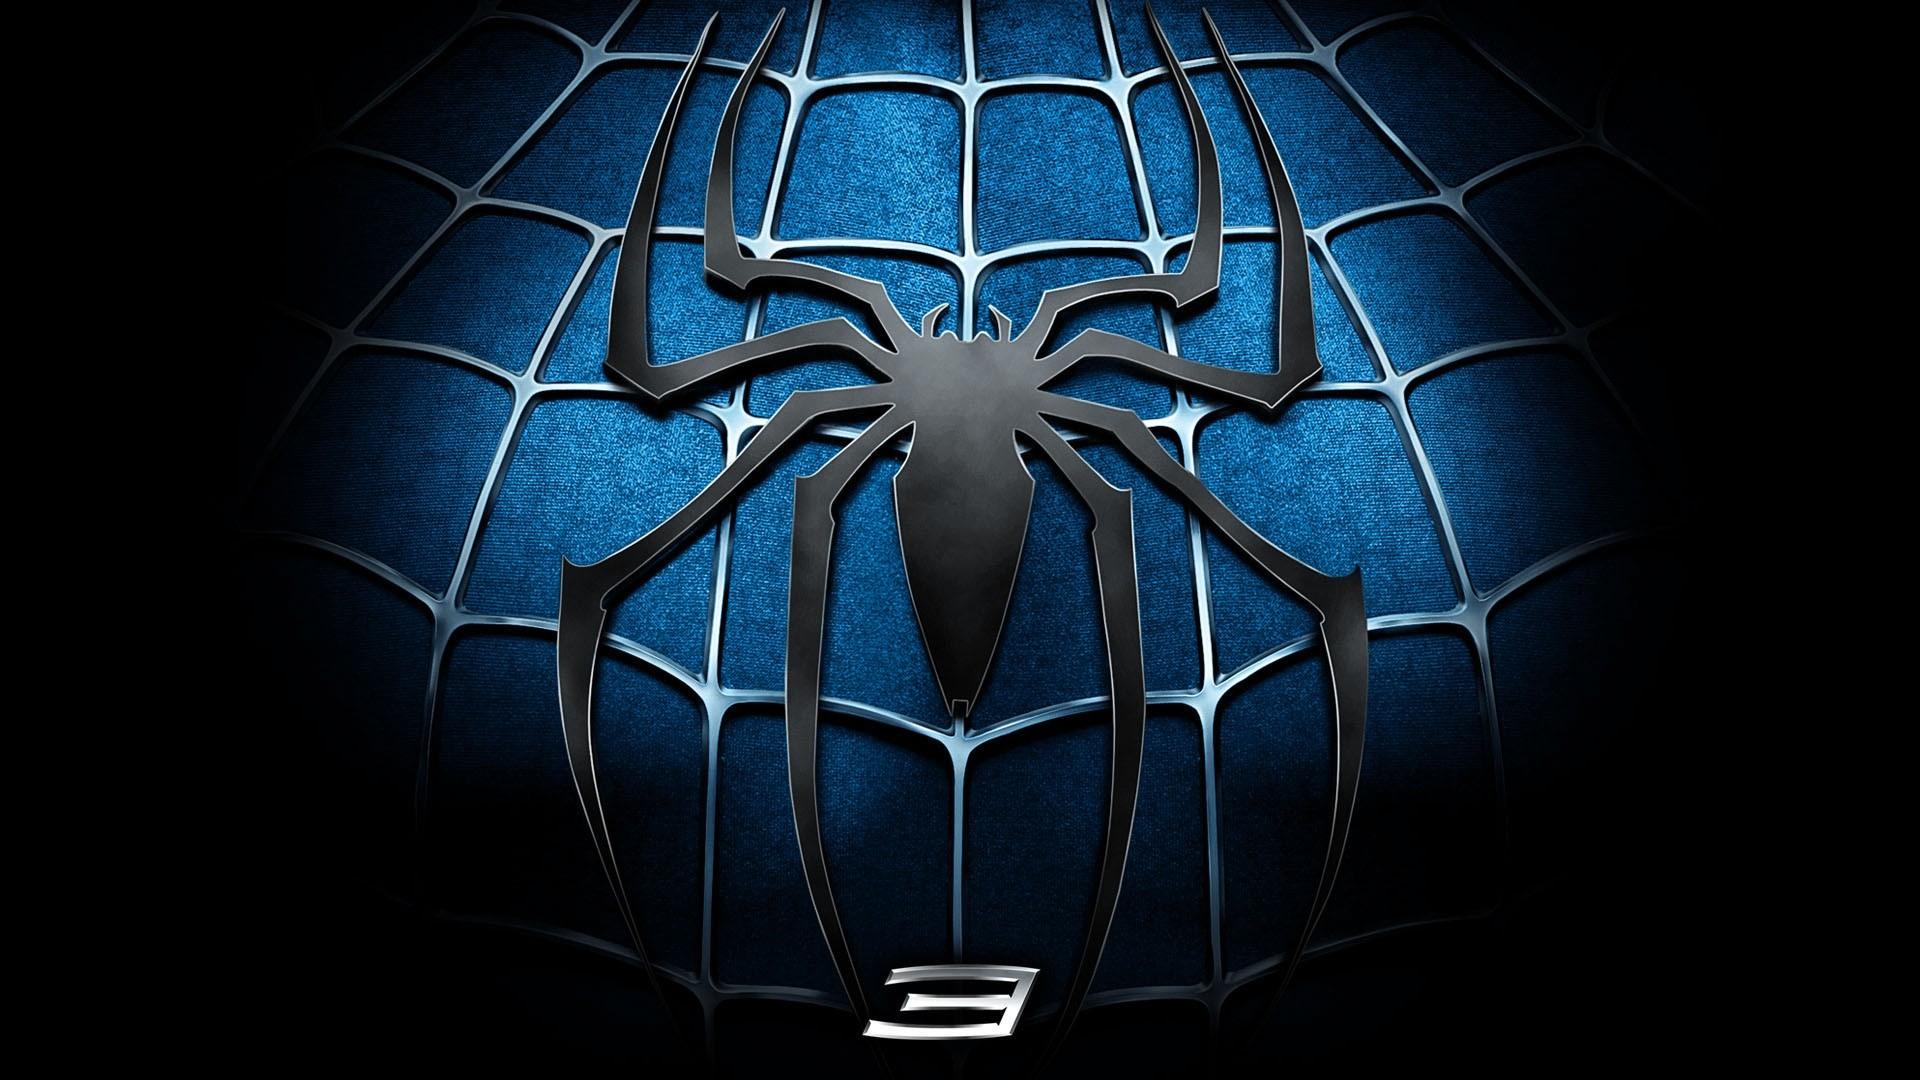 Black Spiderman Wallpaper High Quality Resolution – Kemecer.com